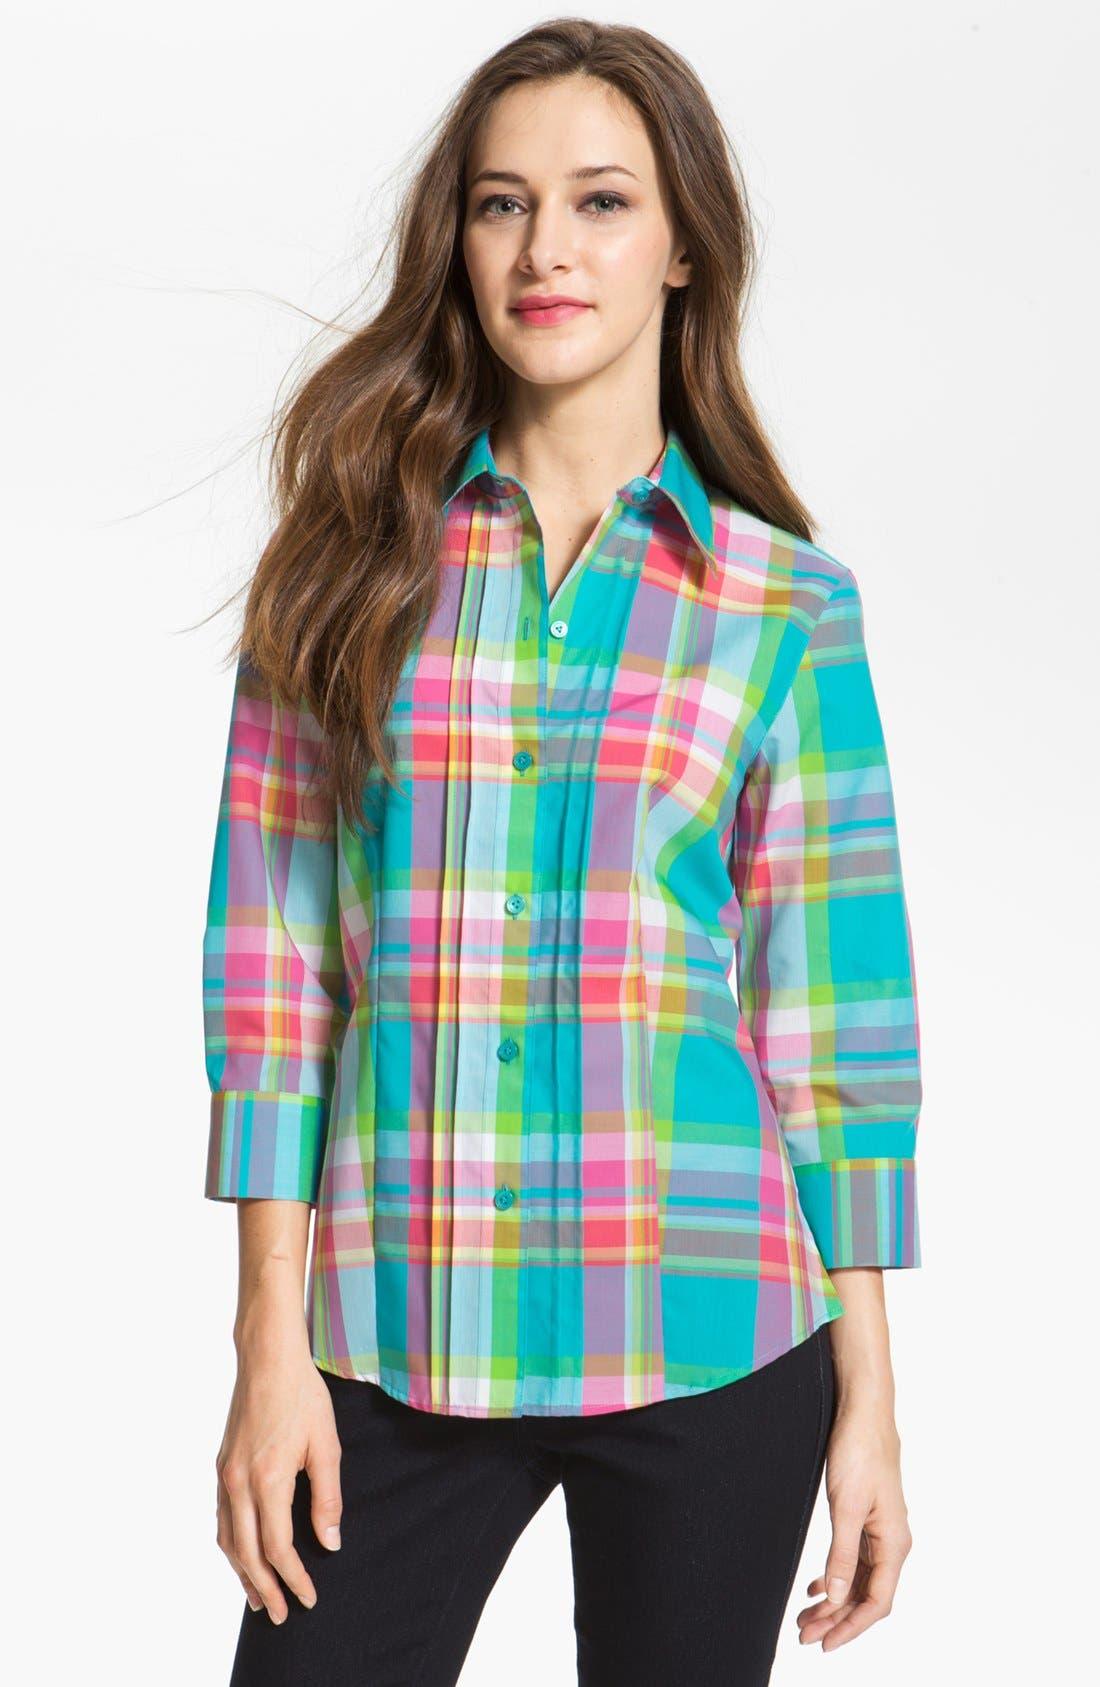 Alternate Image 1 Selected - Foxcroft Three Quarter Sleeve Plaid Shirt (Petite)